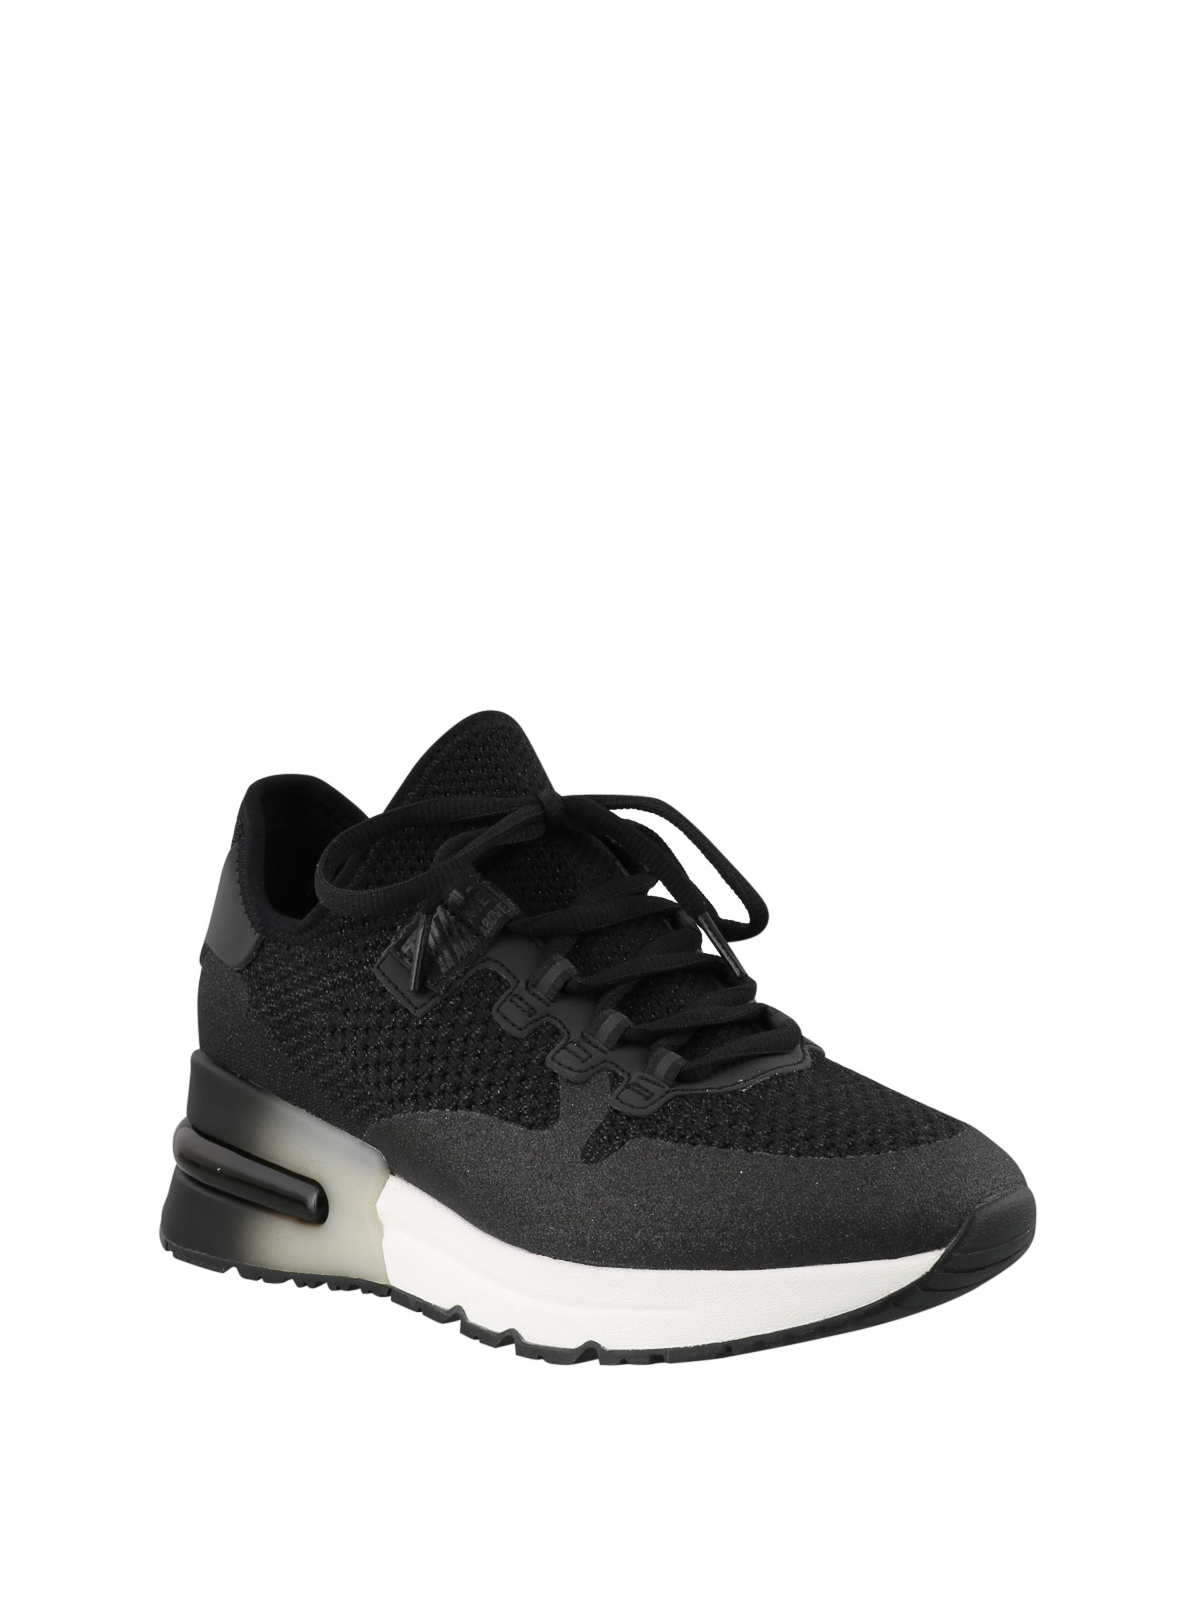 Ash - Krush sneakers - trainers